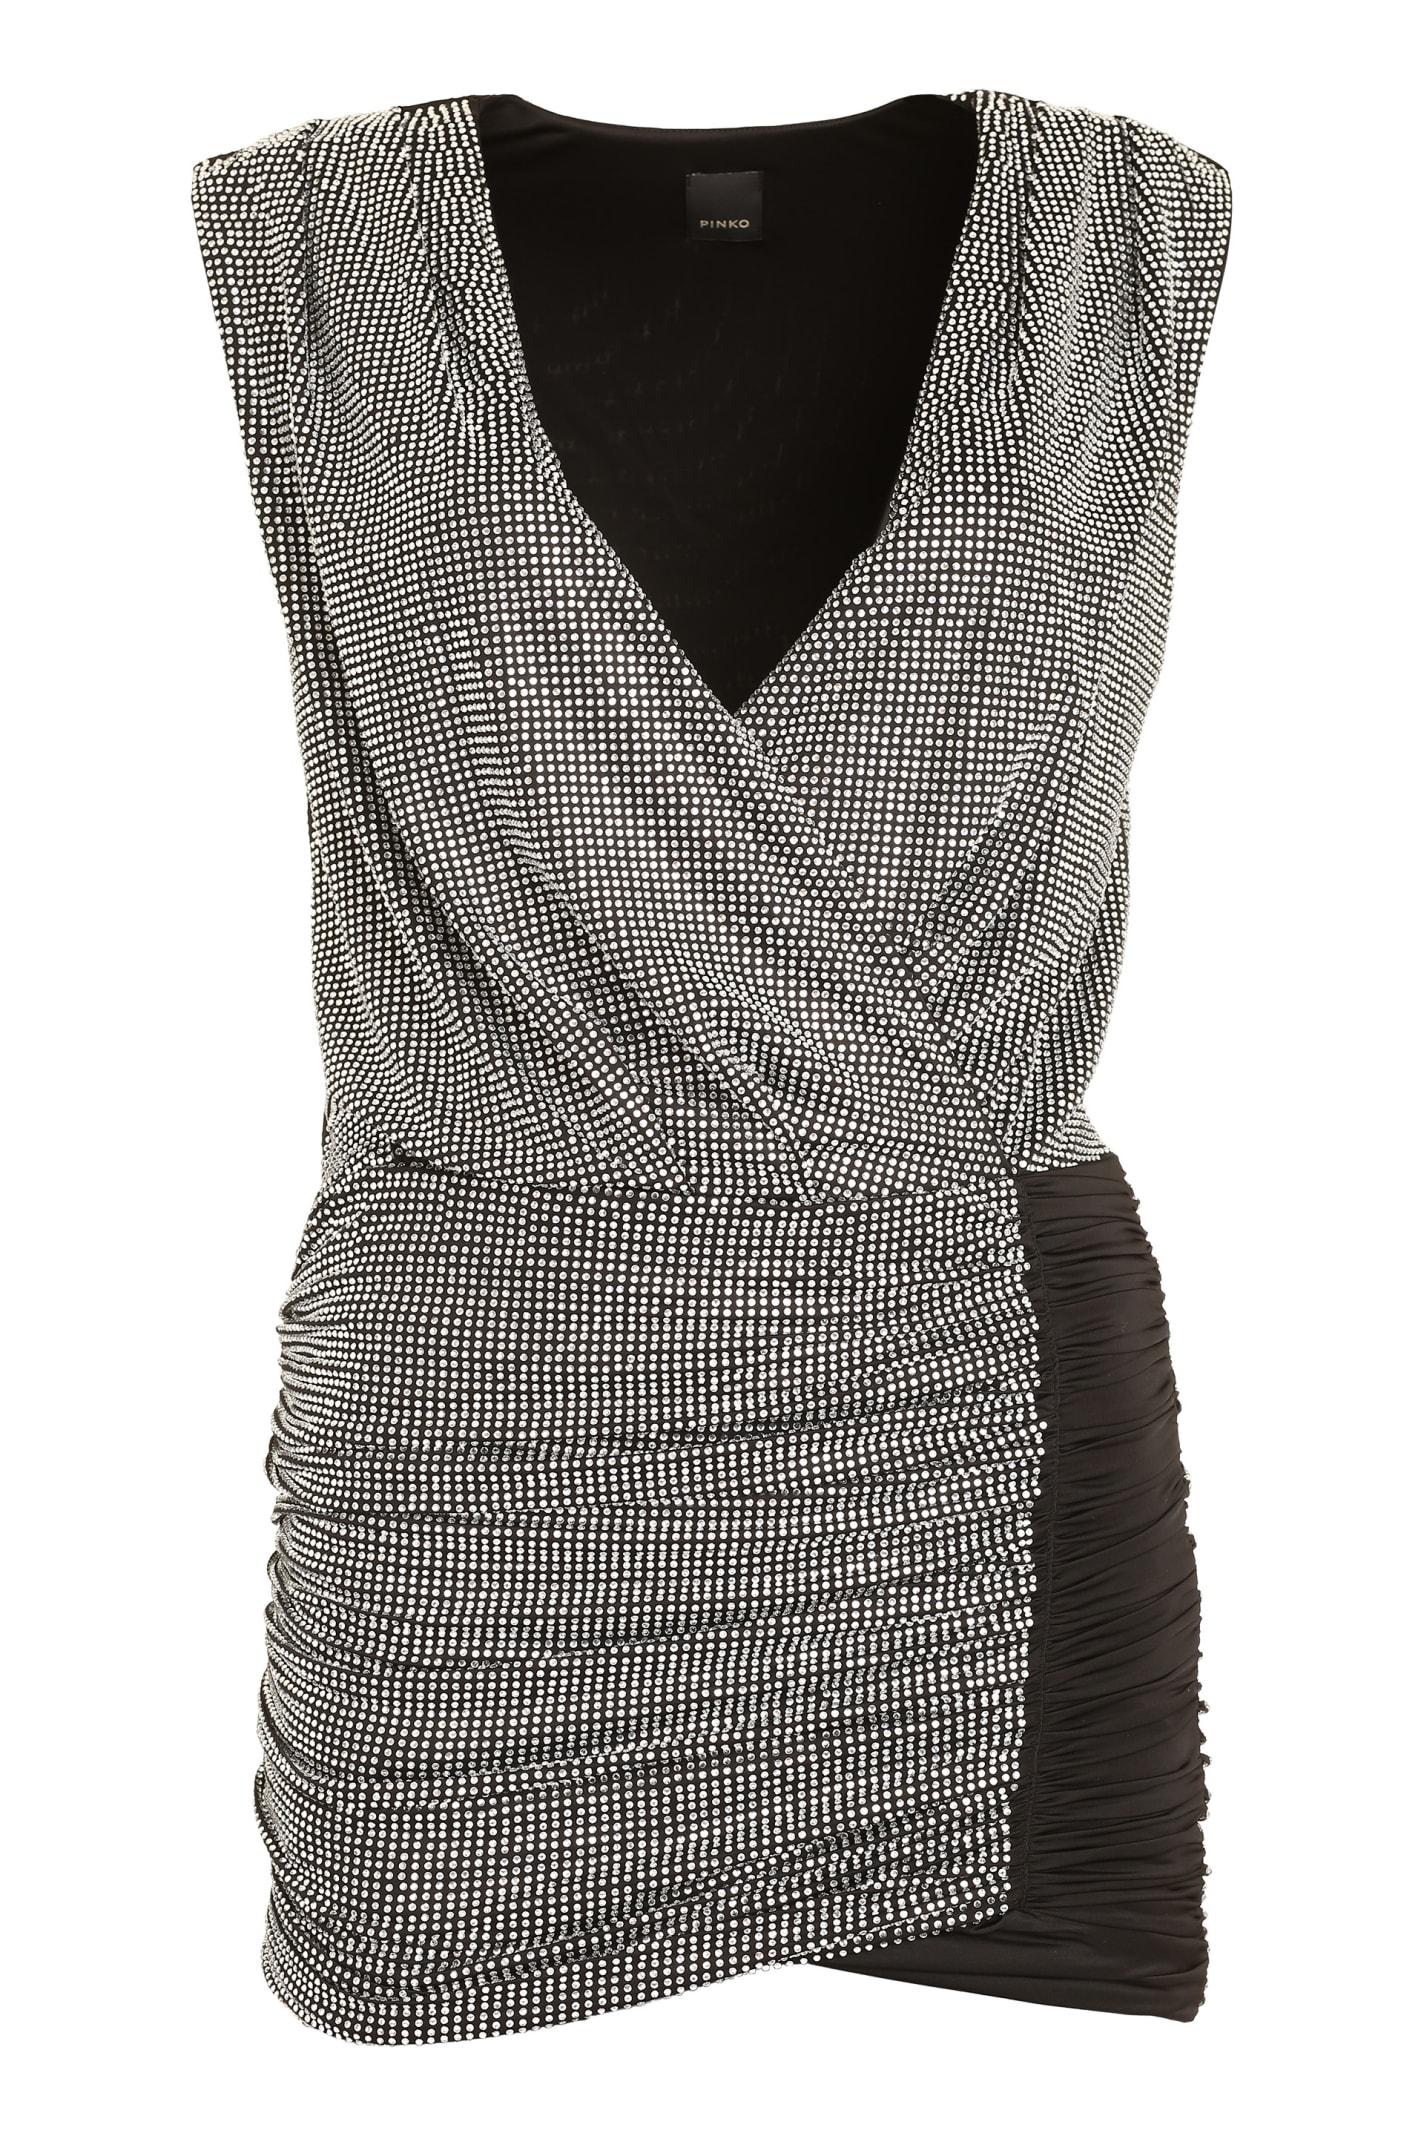 Buy Pinko Gastone Rhinestone Mini Dress online, shop Pinko with free shipping